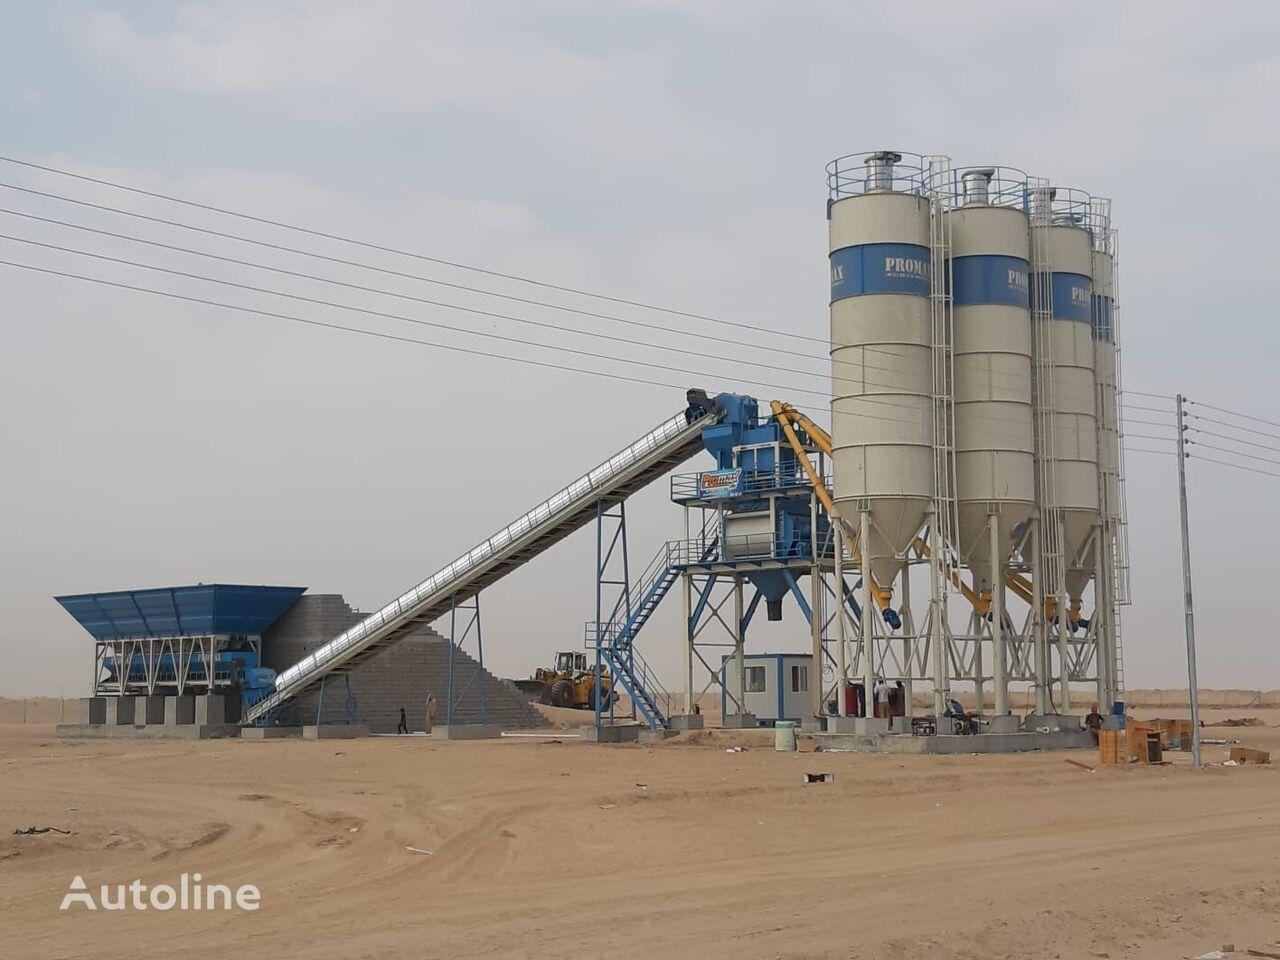 PROMAX S130-TWN (130m3/h) STATIONARY Concrete Batching Plant  planta de hormigón nueva